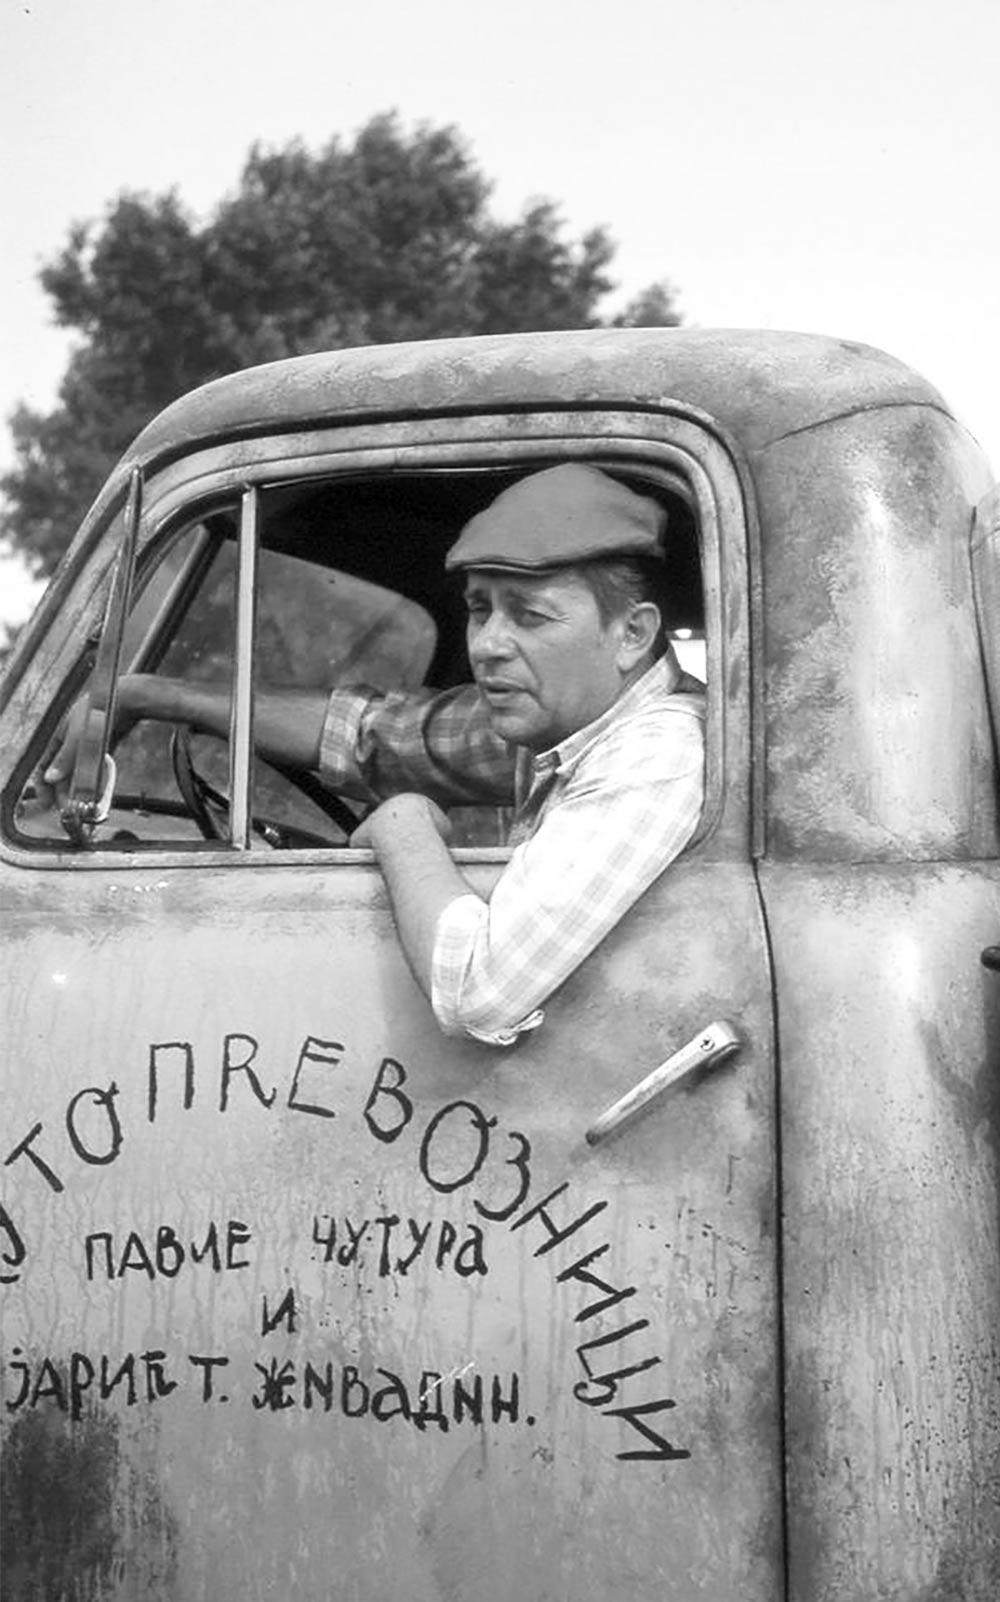 Miodrag Petrovic Ckalja 2